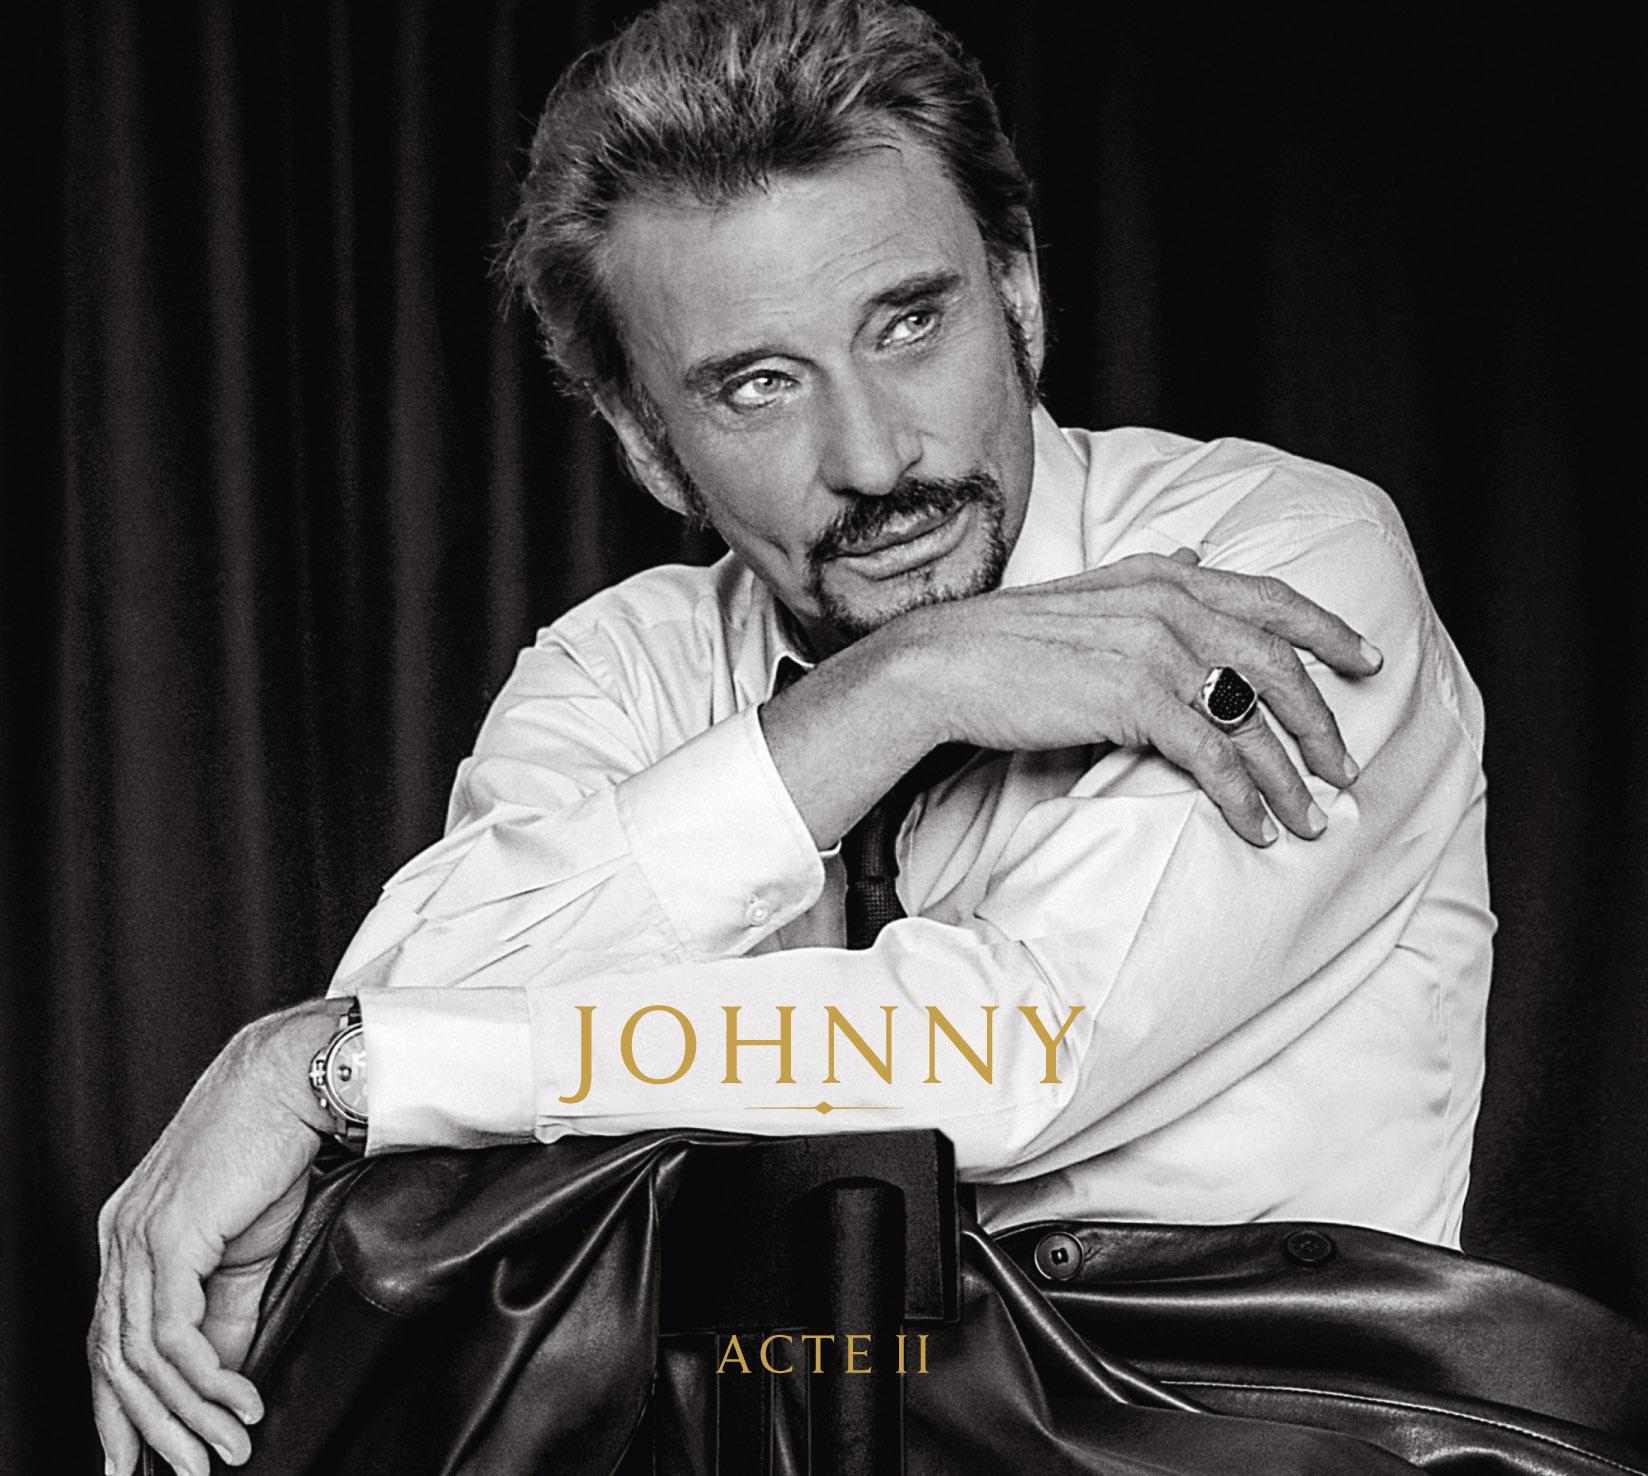 Visuel de l'Acte II Johnny34